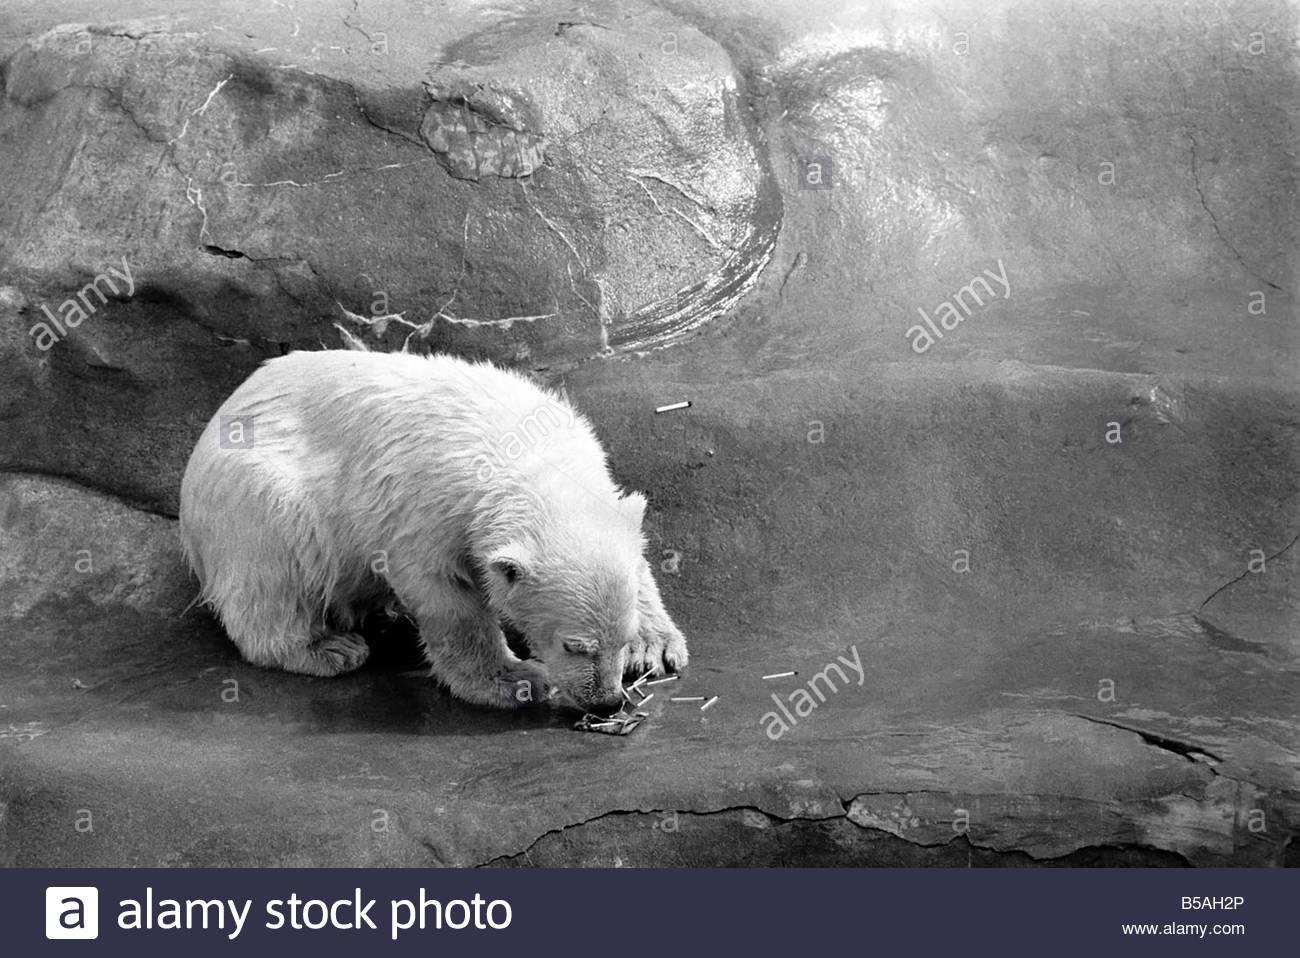 polar bears at bristol zoo april 1975 75 2224 001 B5AH2P